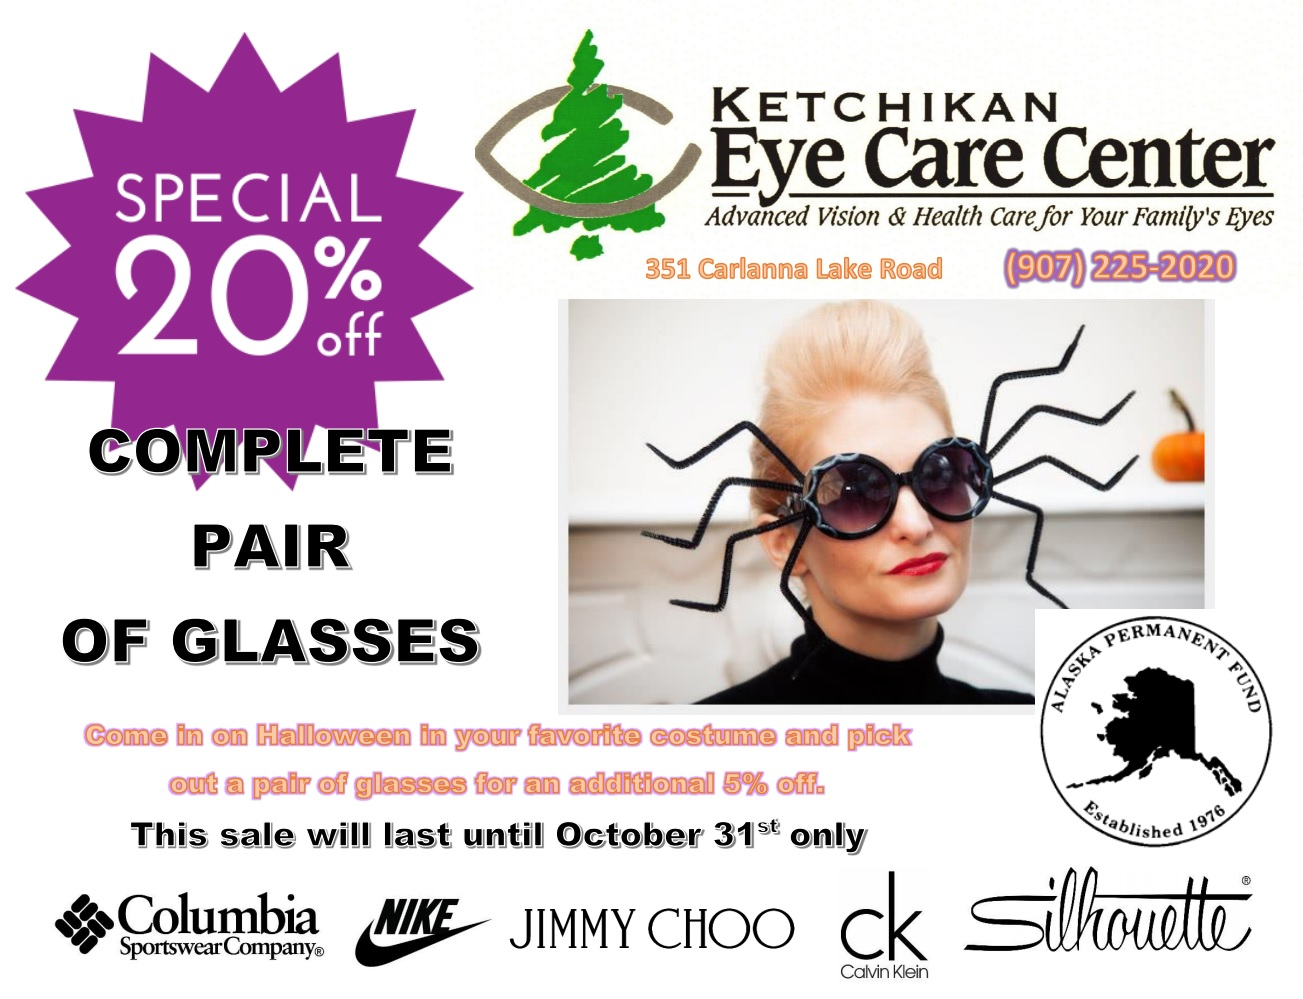 Alaska Permanent Fund Dividend - Ketchikan Eye Care Center ...